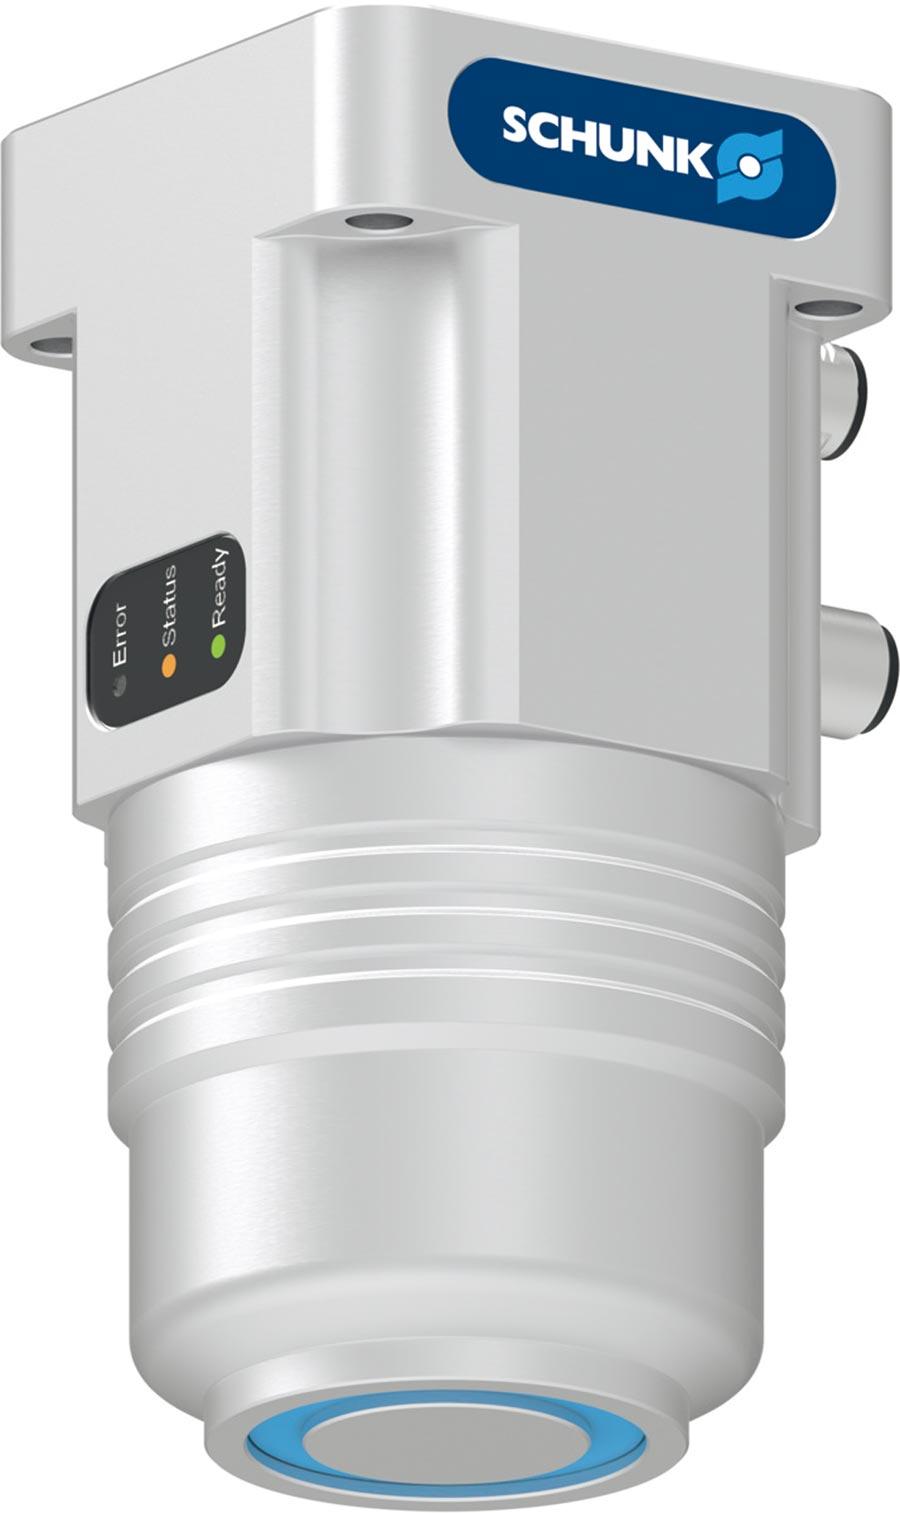 SCHUNK電動磁力機械夾爪。圖/業者提供